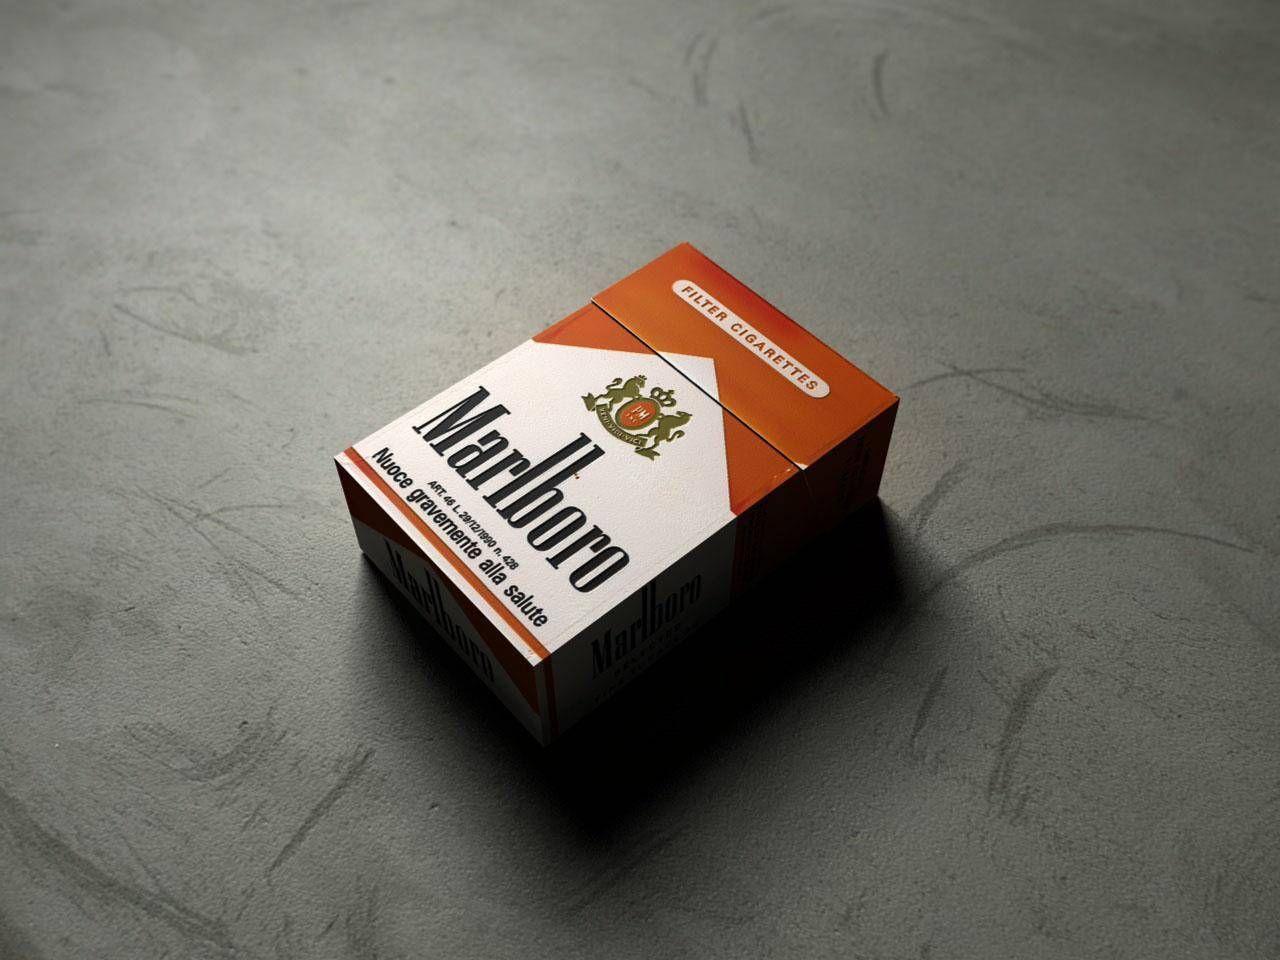 Buy cigarettes 555 from Oklahoma